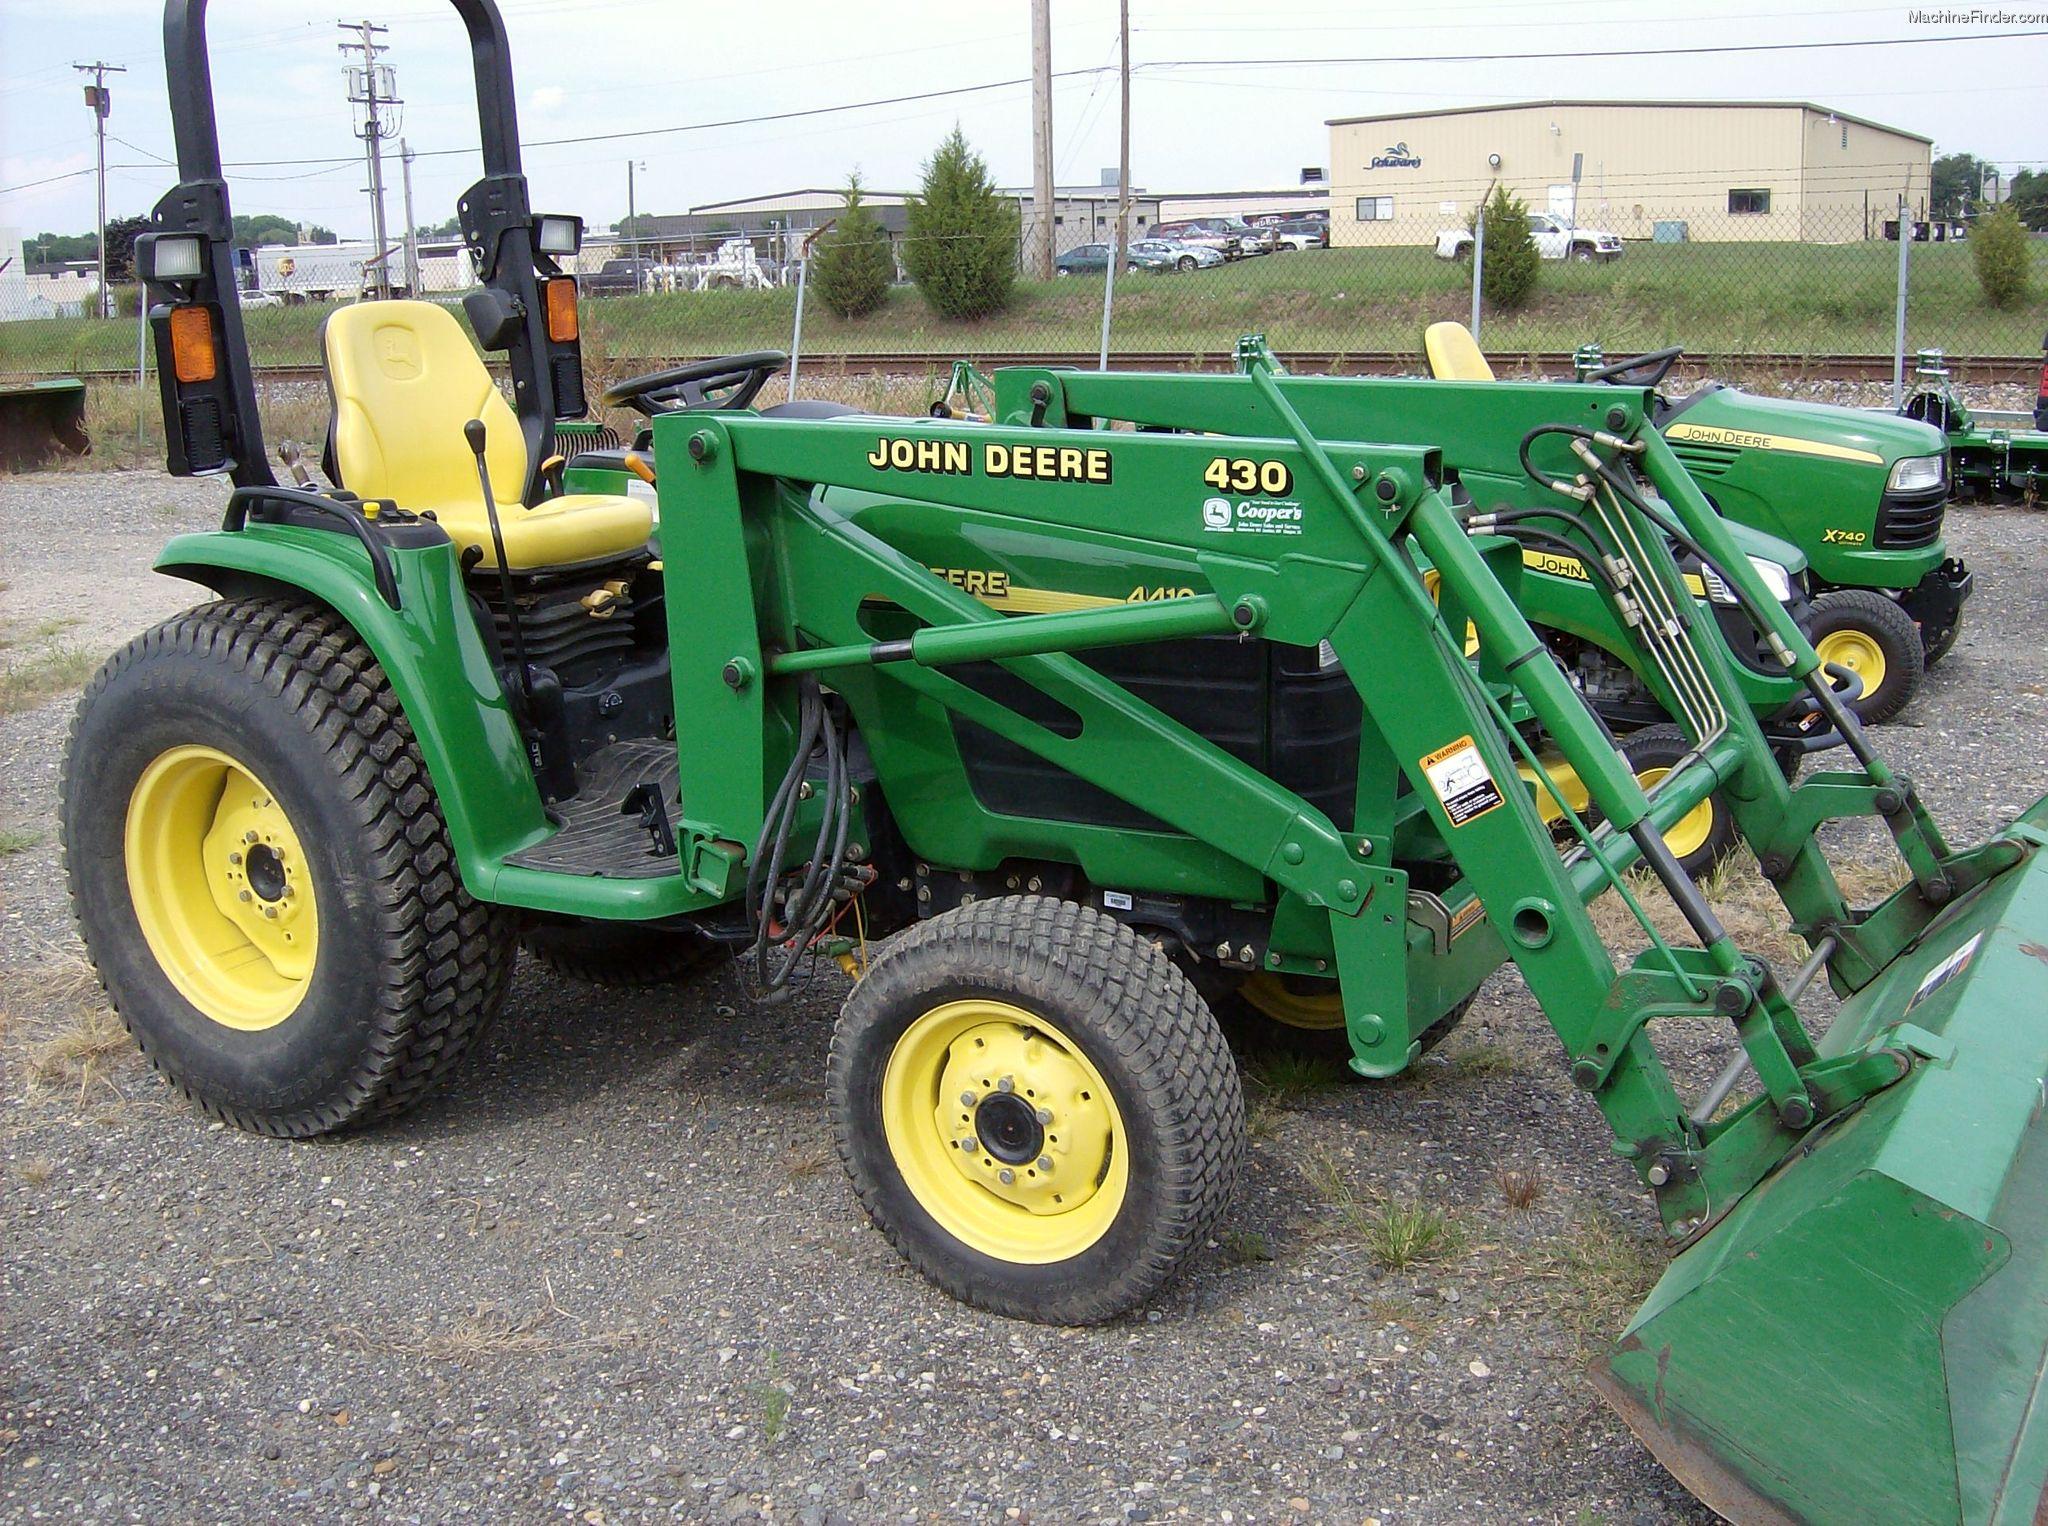 2004 John Deere 4410 Tractors - Compact (1-40hp.) - John ...